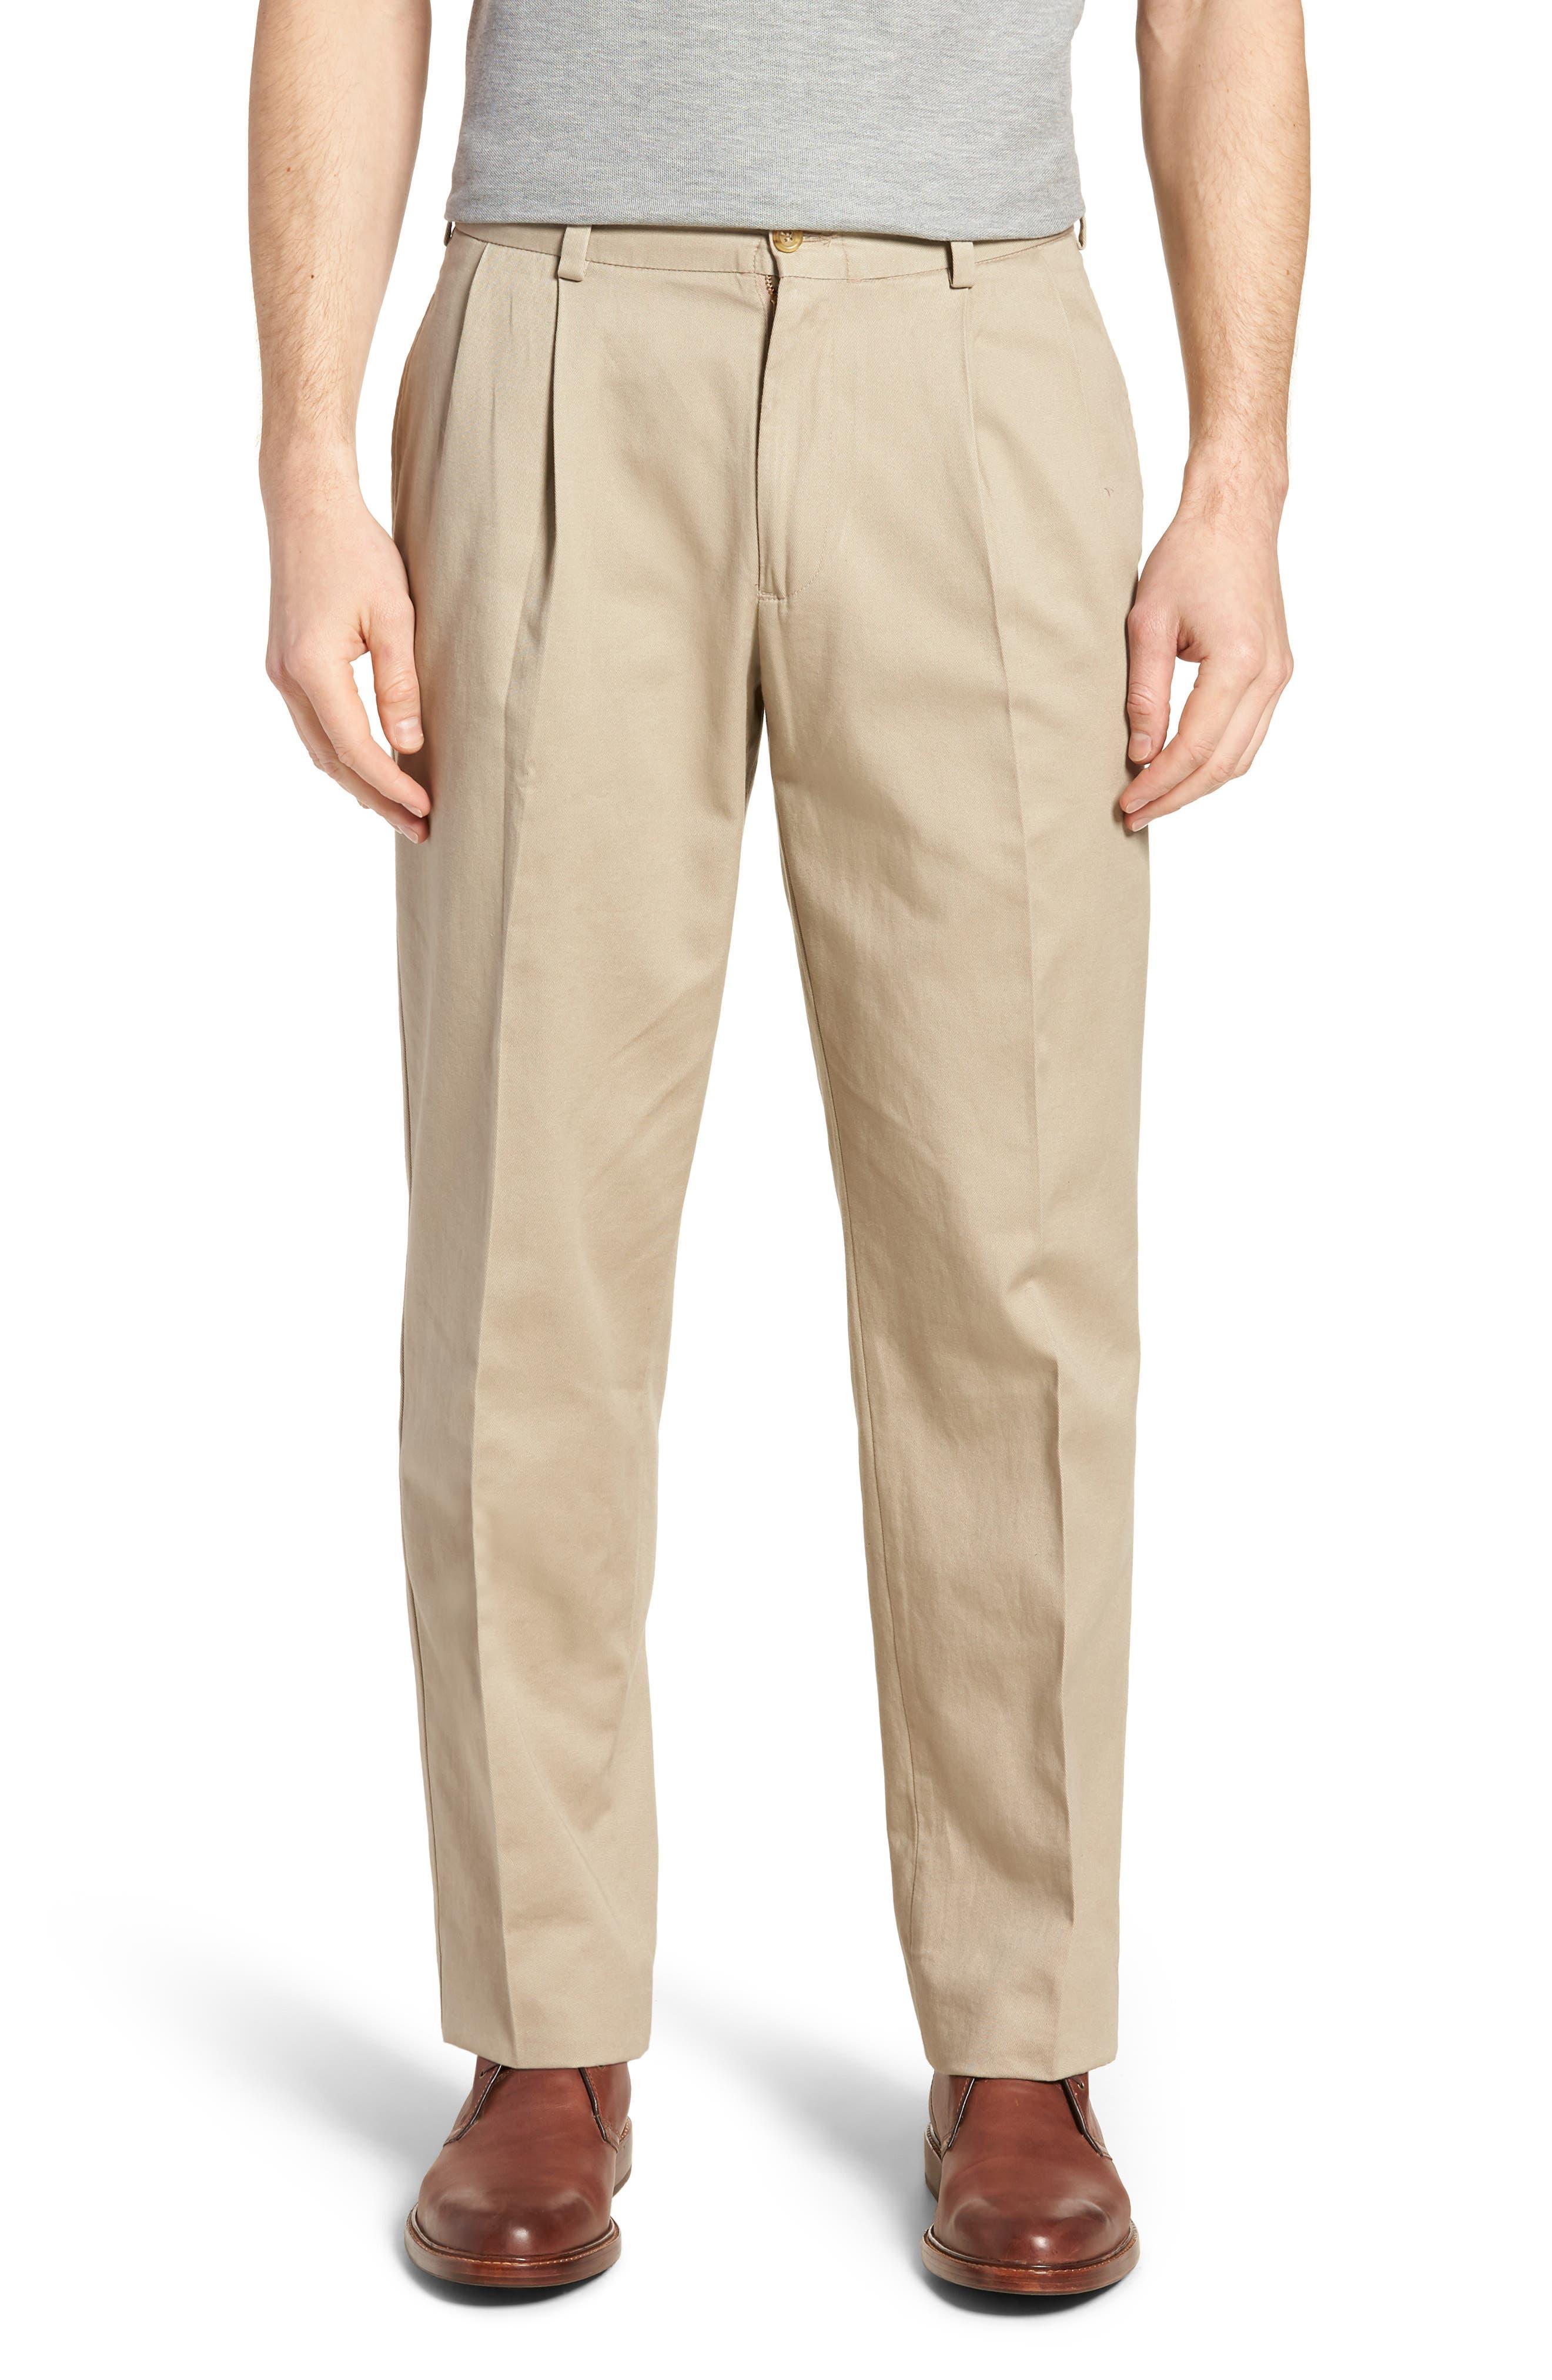 M2 Classic Fit Pleated Vintage Twill Pants,                             Main thumbnail 1, color,                             Khaki